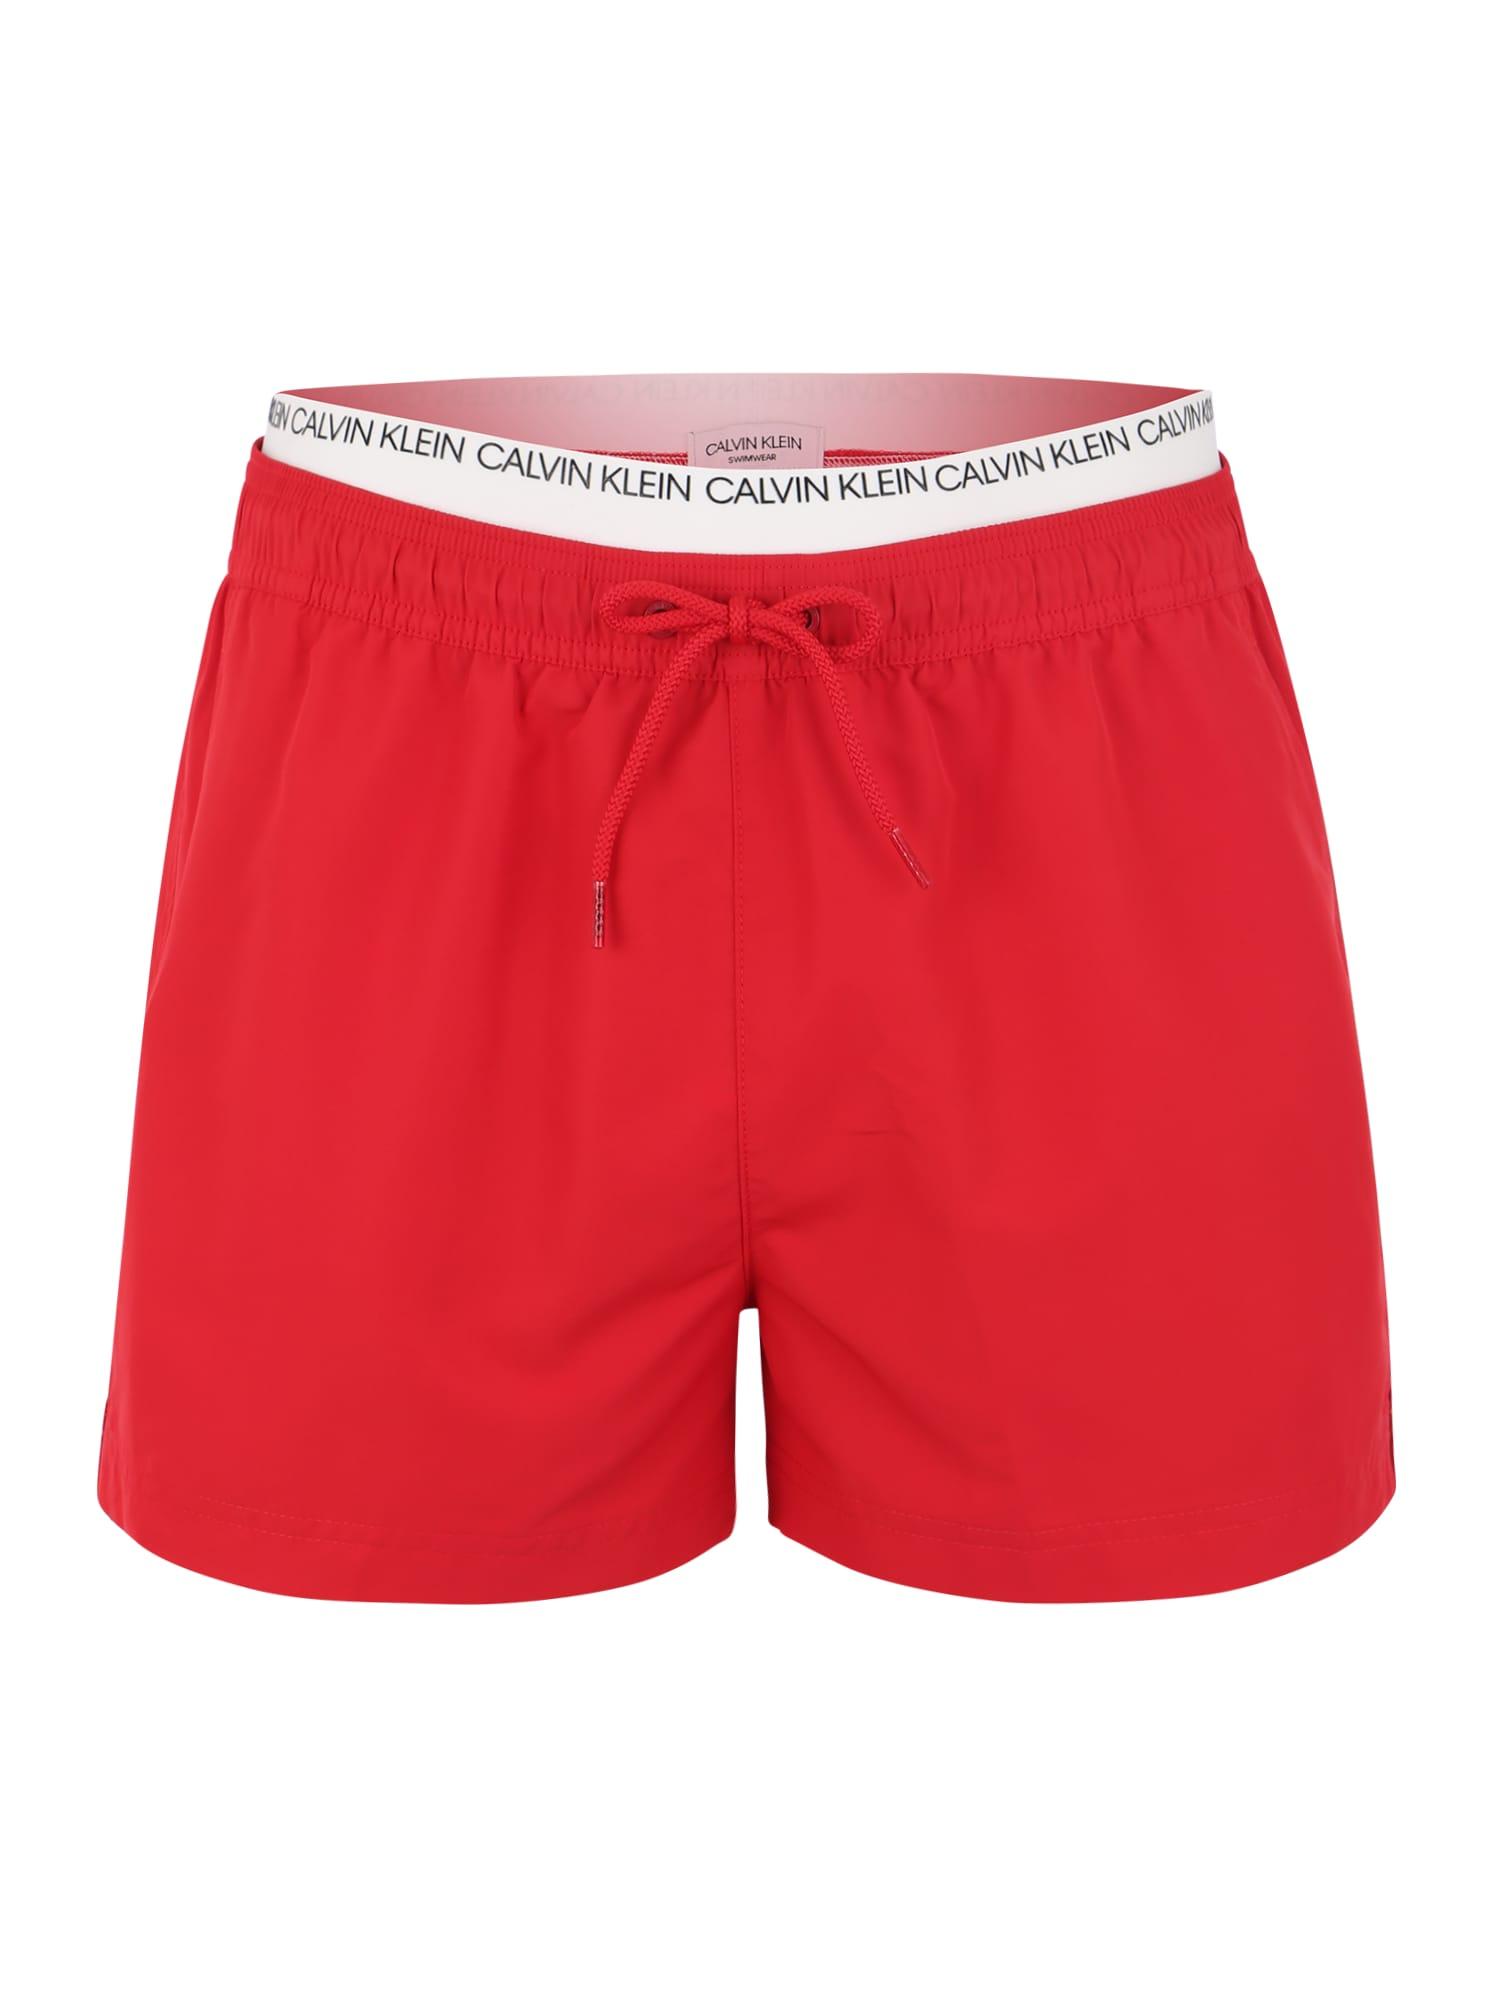 Plavecké šortky DOUBLE WAISTBAND červená bílá Calvin Klein Swimwear